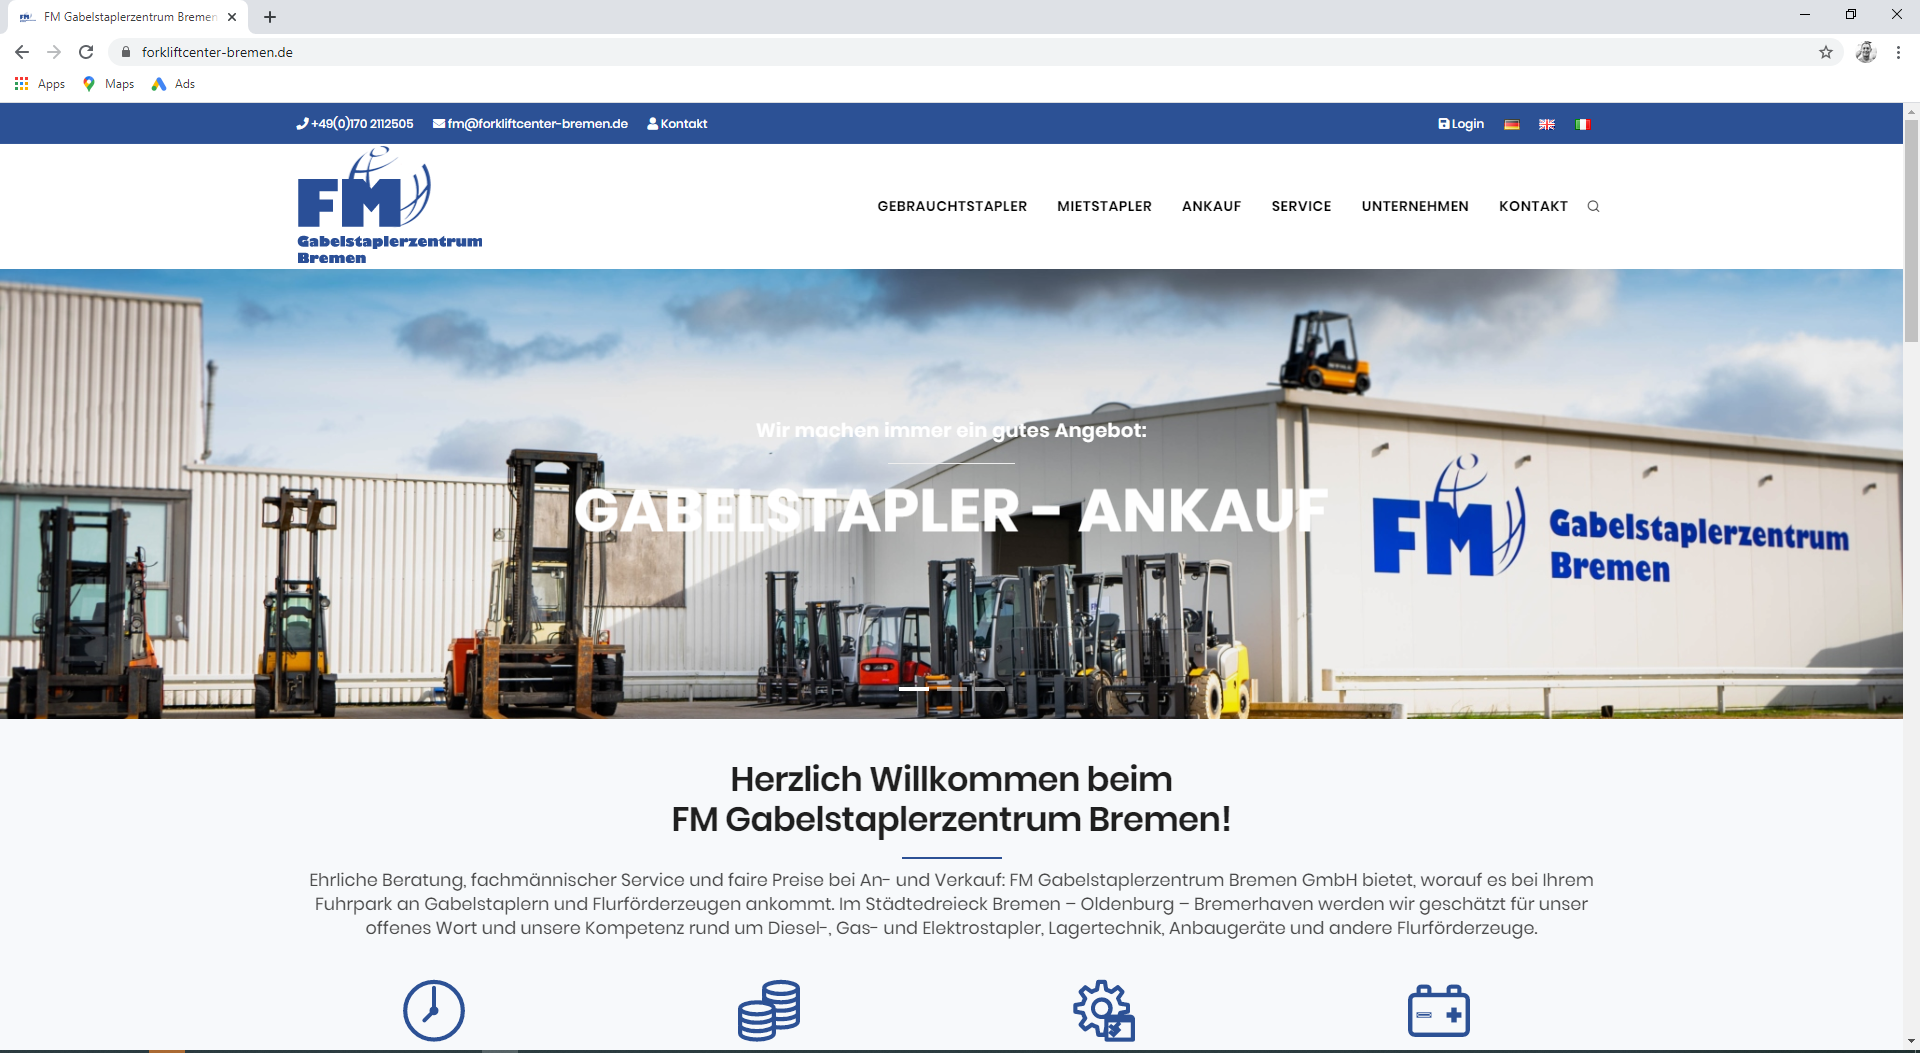 FM Gabelstaplerzentrum Bremen GmbH